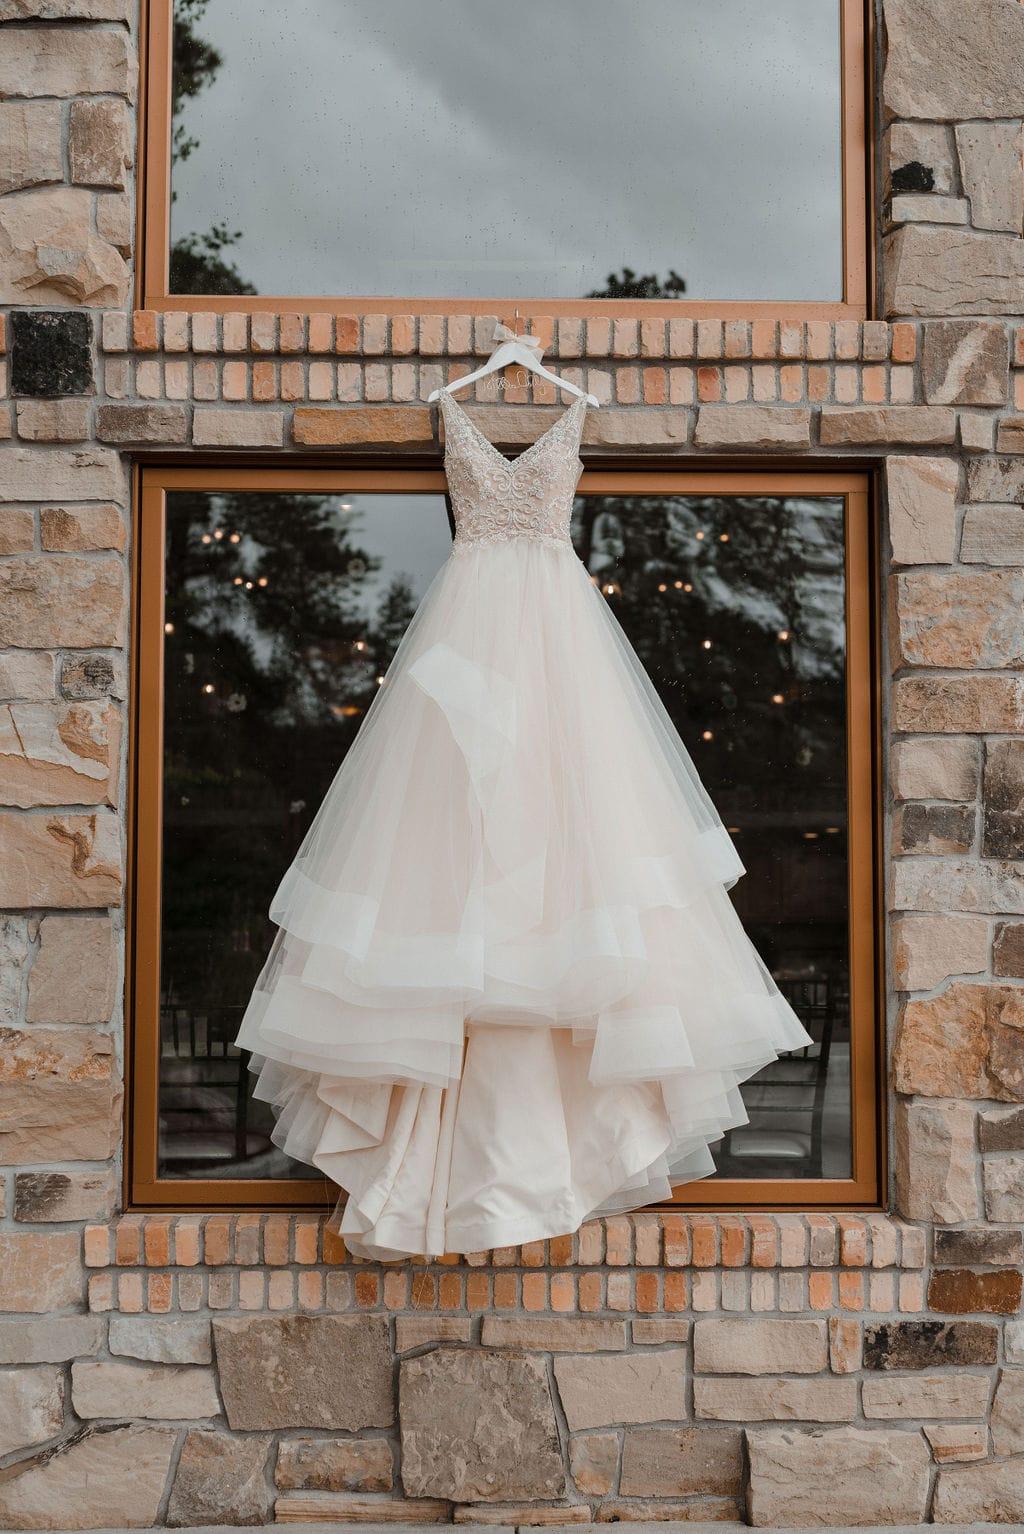 Wedding Dress hanging on the side of Della Terra Wedding Venue